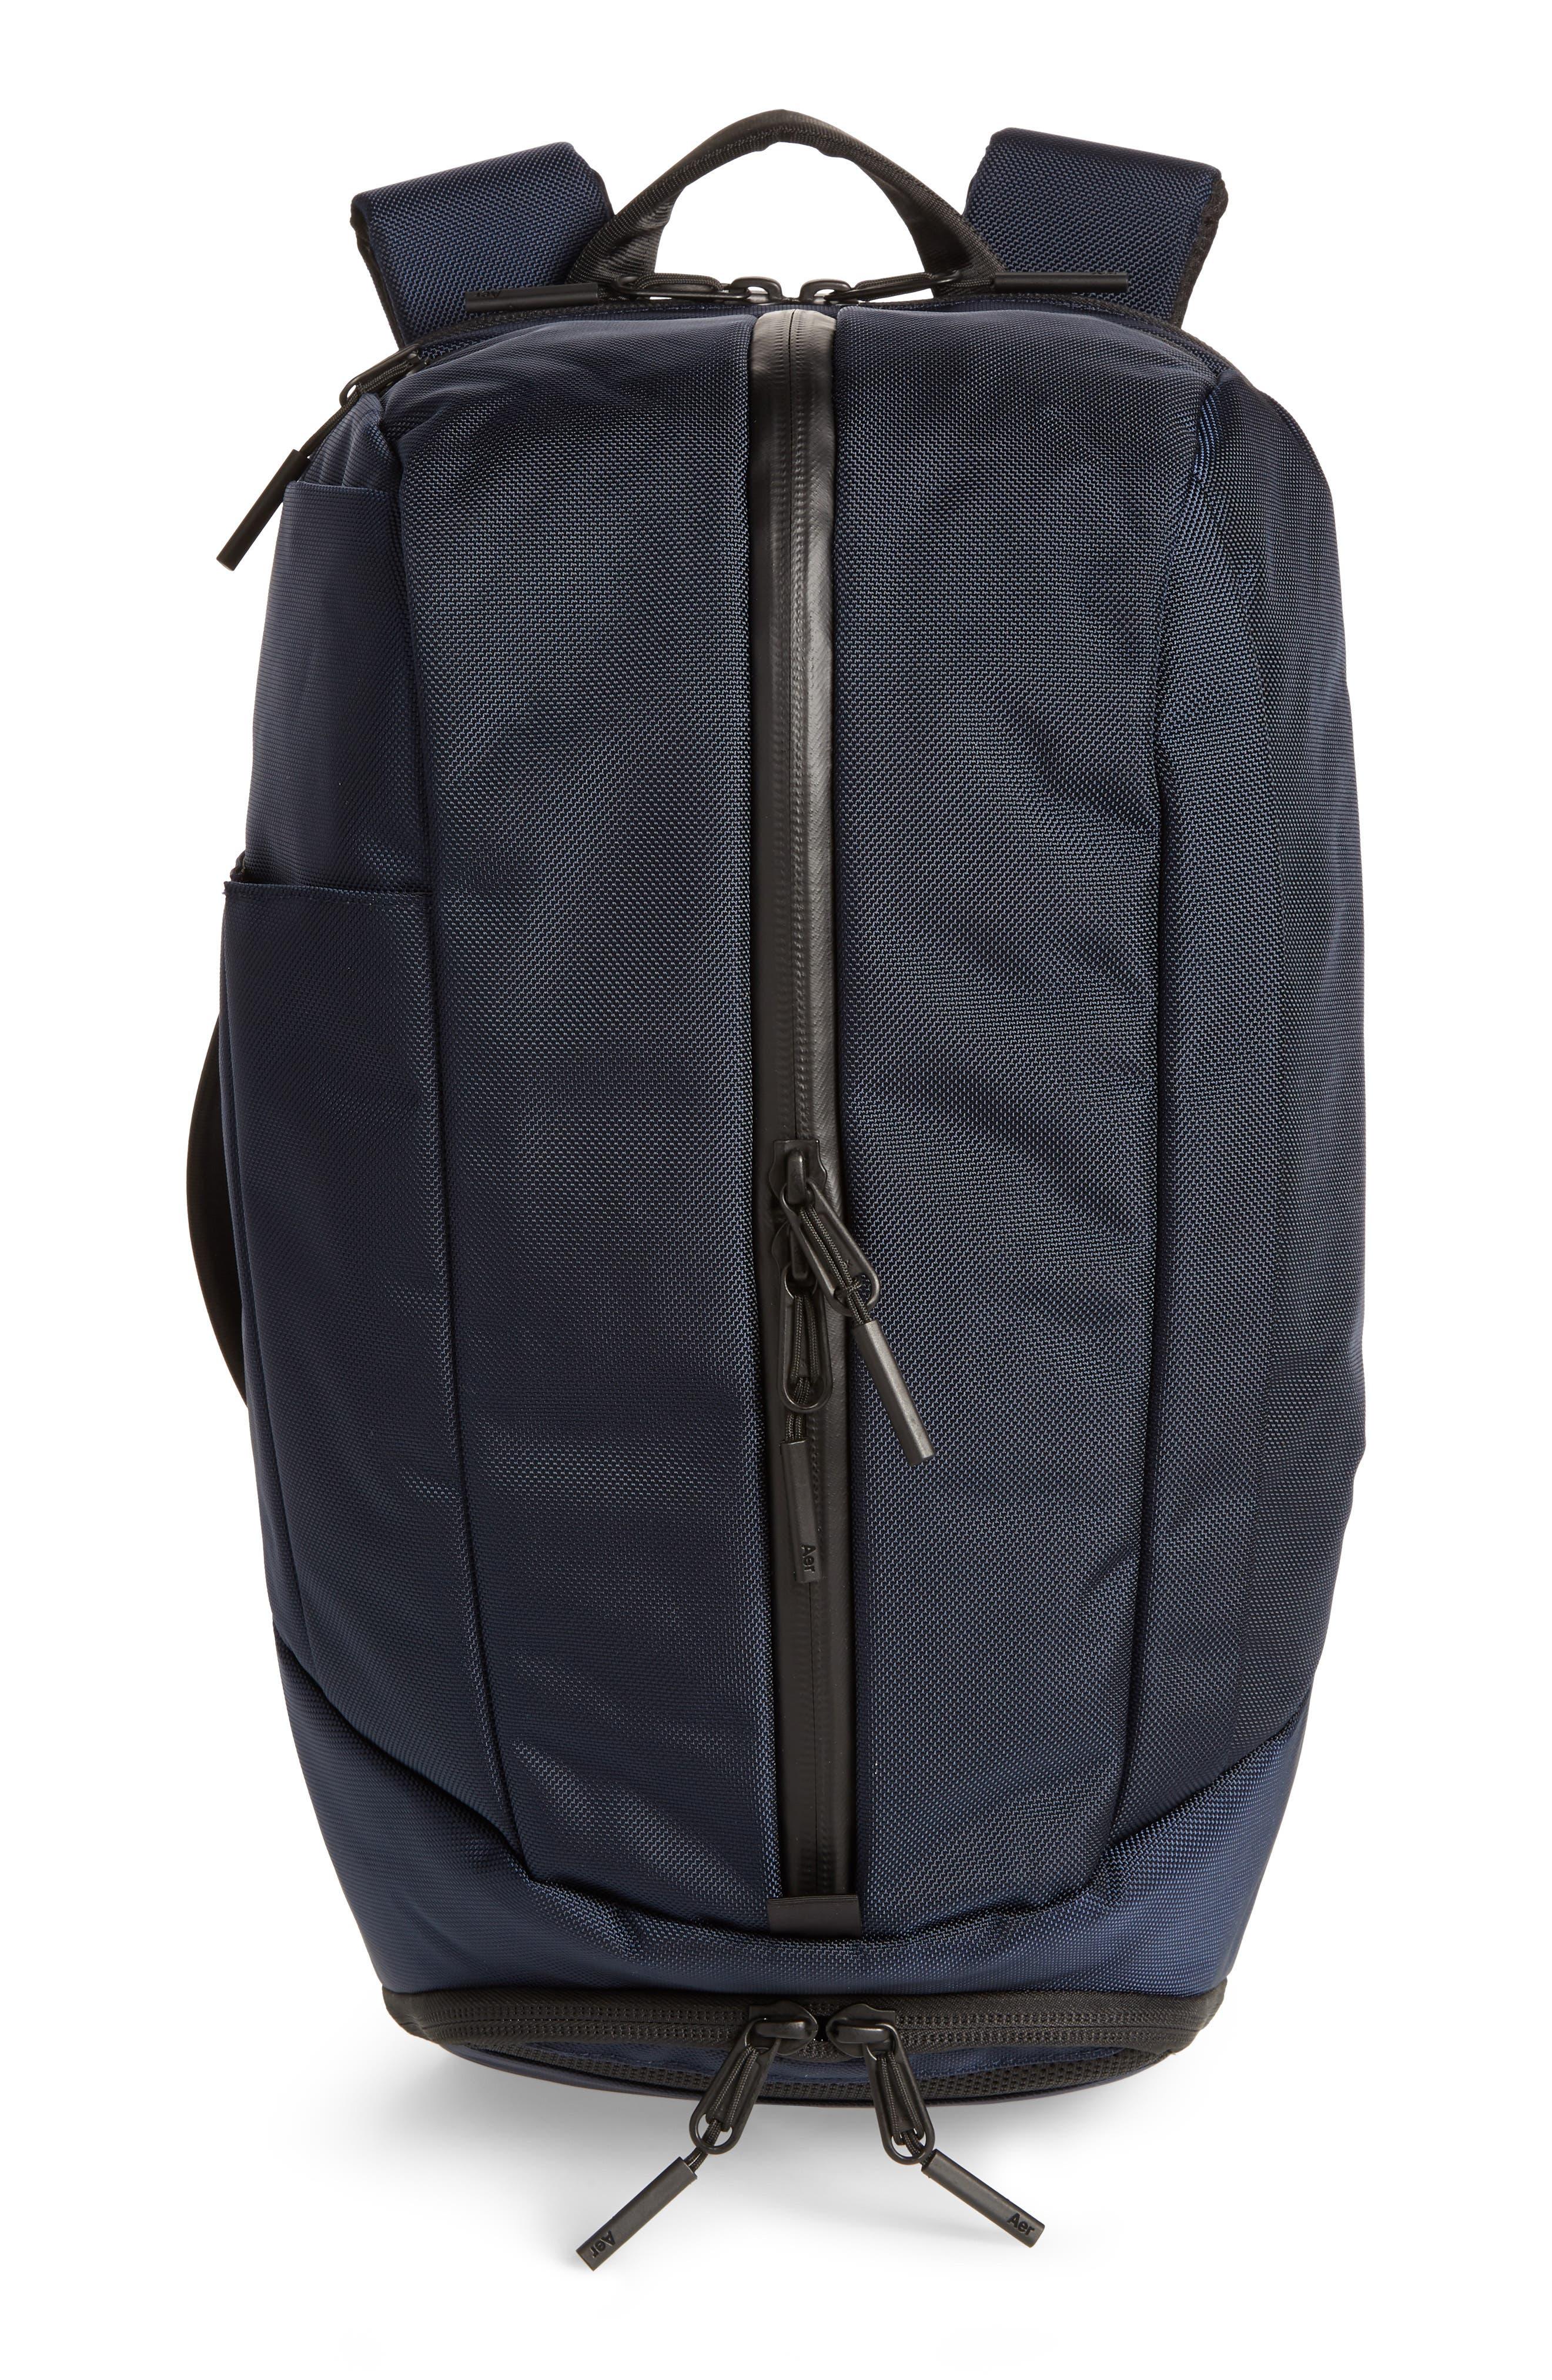 Aer Duffel Pack 2 Convertible Backpack - Blue In Navy   ModeSens 303538fd24